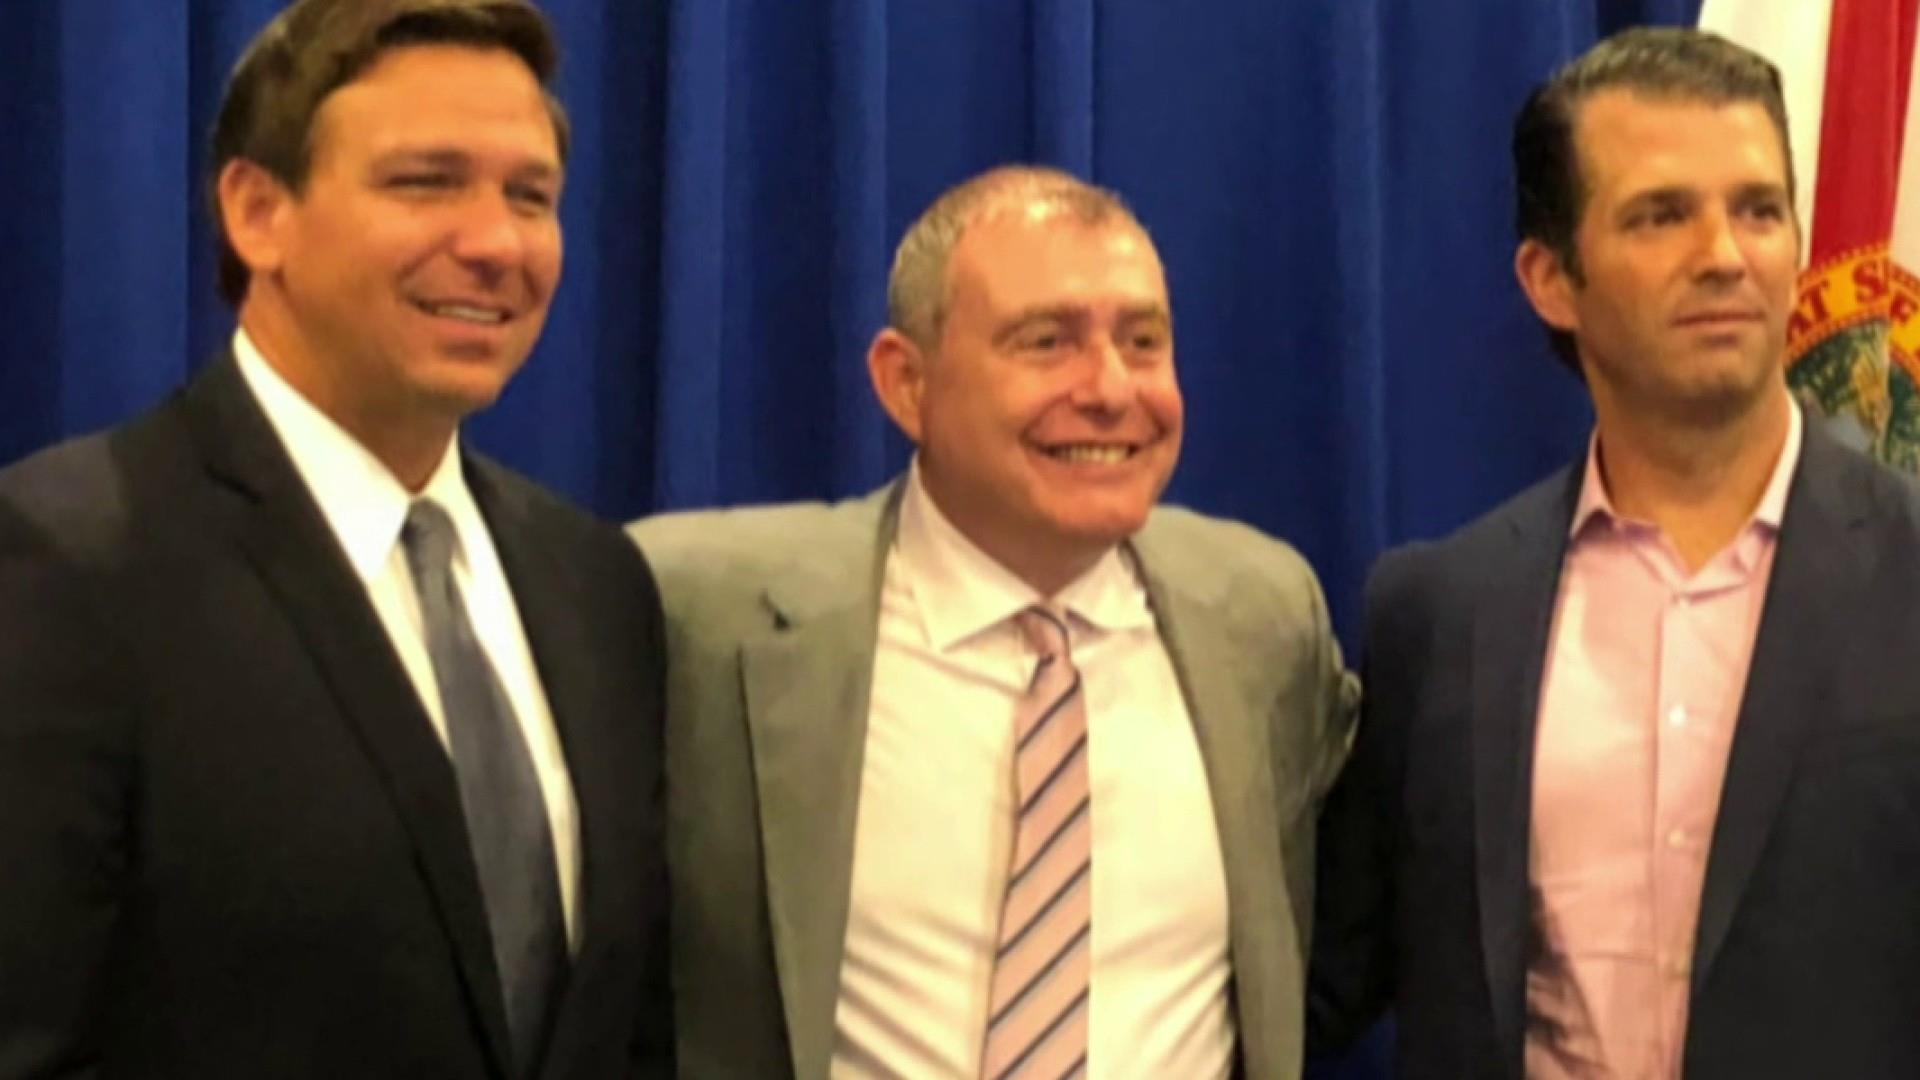 Parnas exchanged texts with FL Gov. DeSantis WSJ report alleges